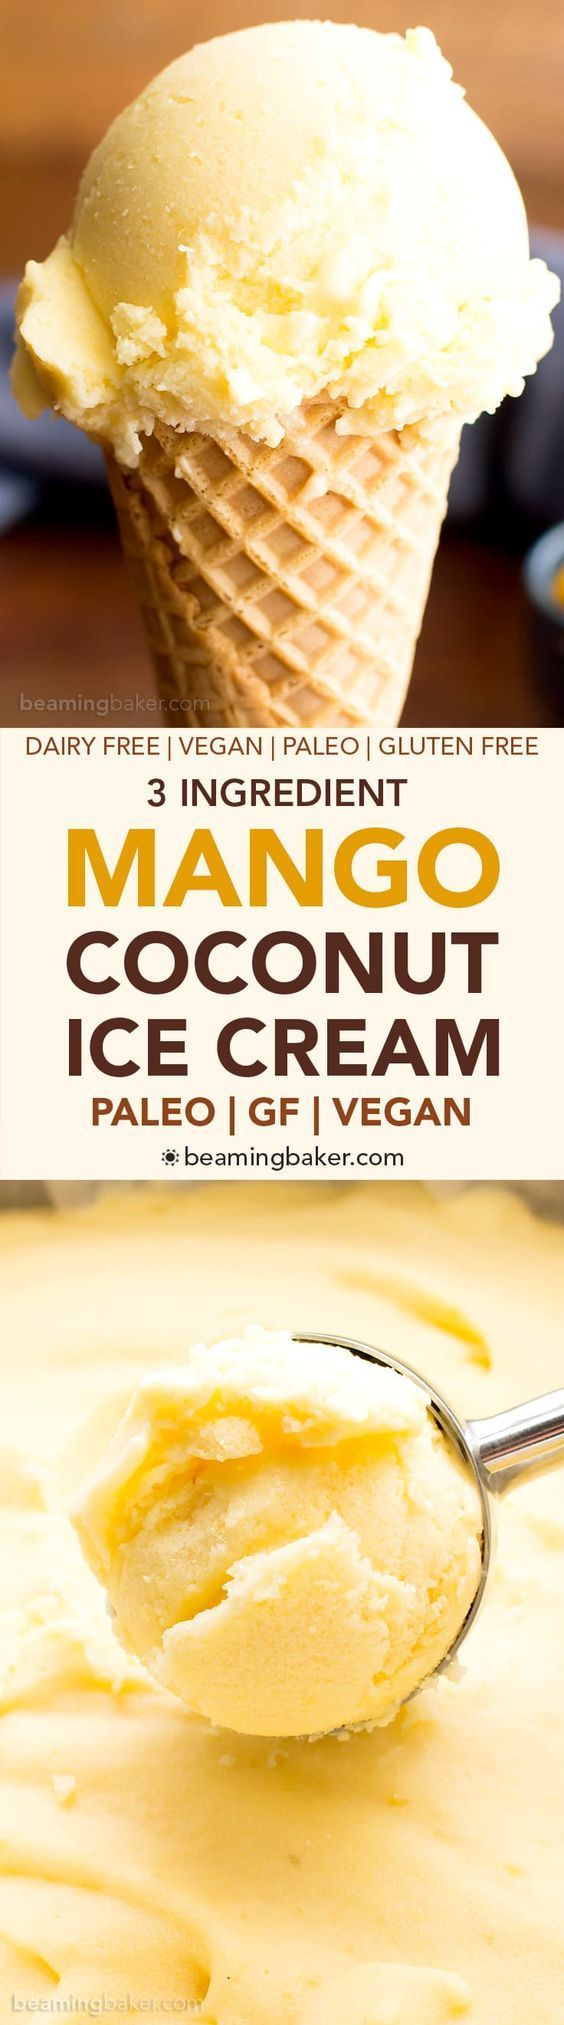 3 Ingredient Mango Coconut Vegan Ice Cream V Df Paleo An Easy